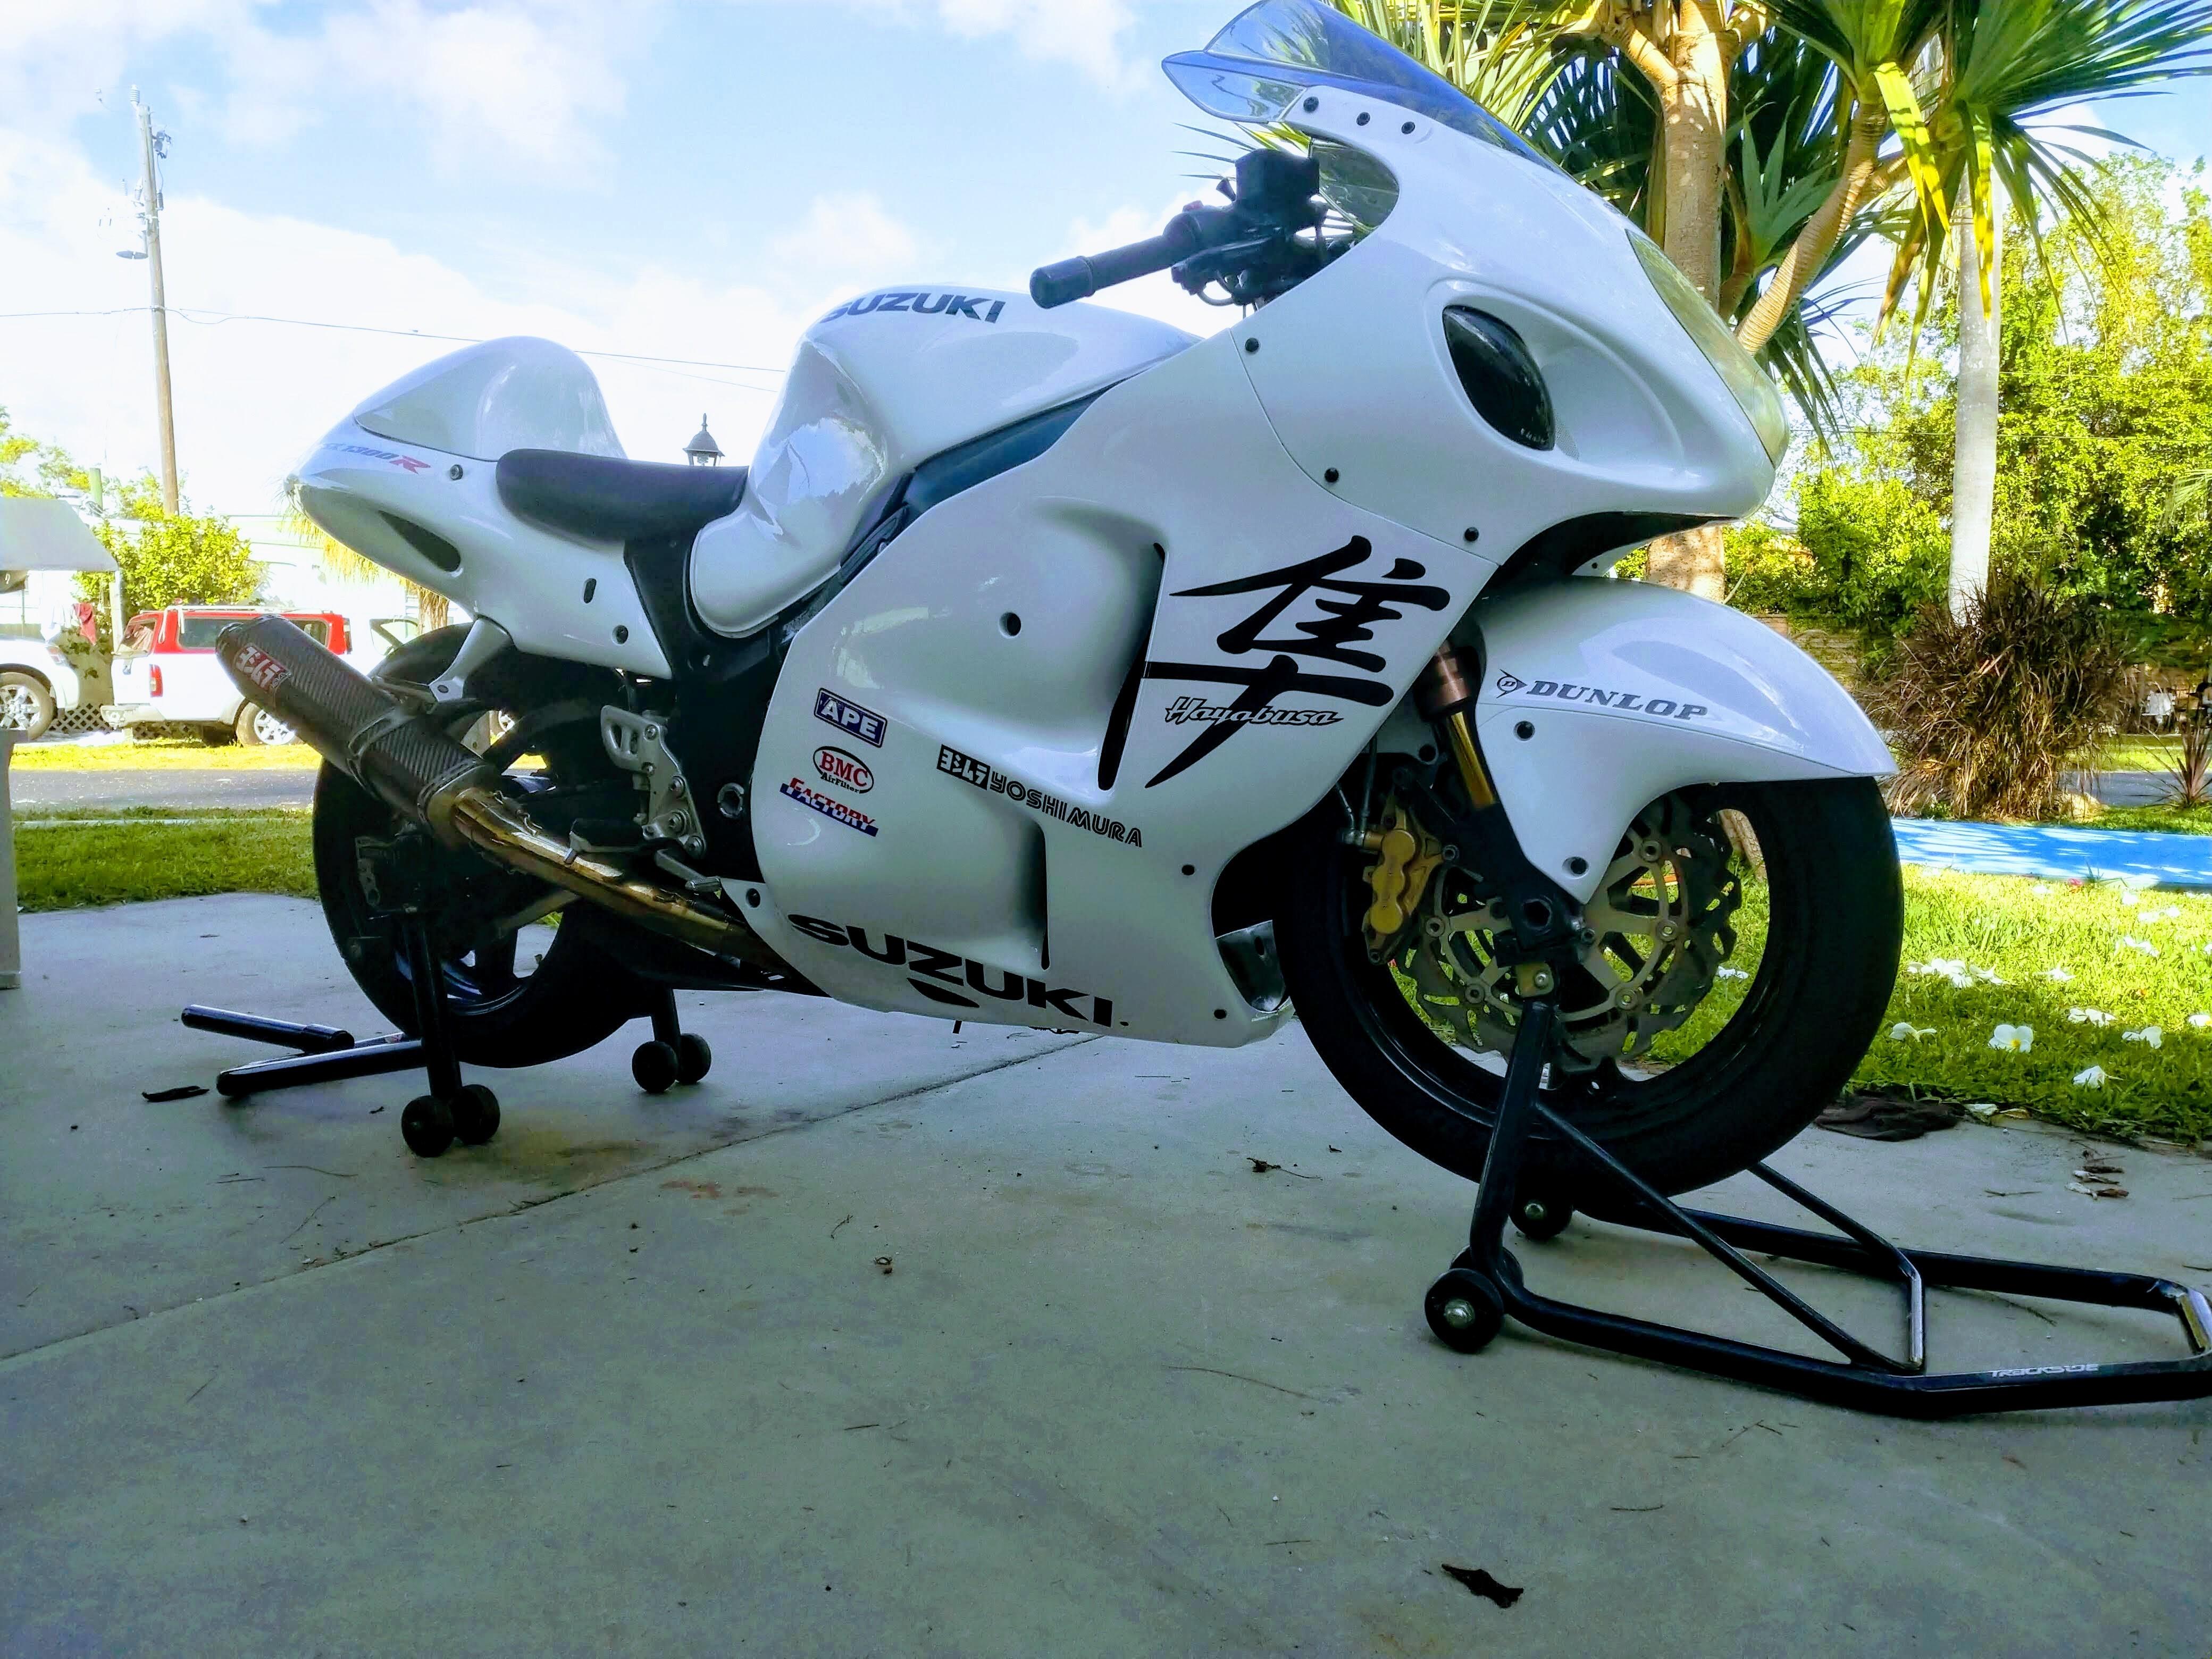 Photo 2007 Suzuki HAYABUSA LIMITED EDITION $169.60169.60